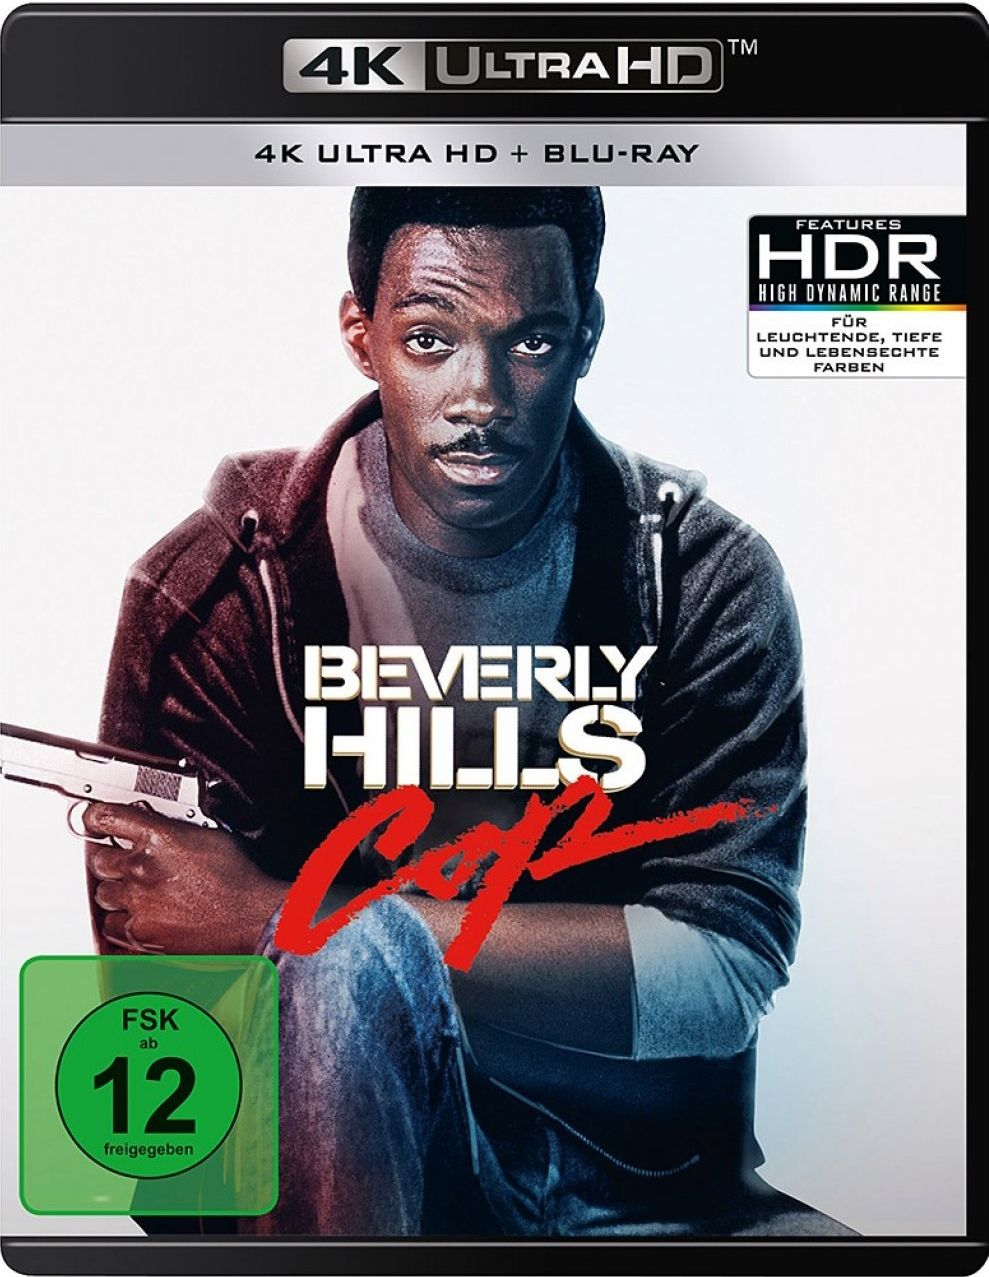 Beverly Hills Cop 1 (2 Discs) (UHD BLURAY + BLURAY)